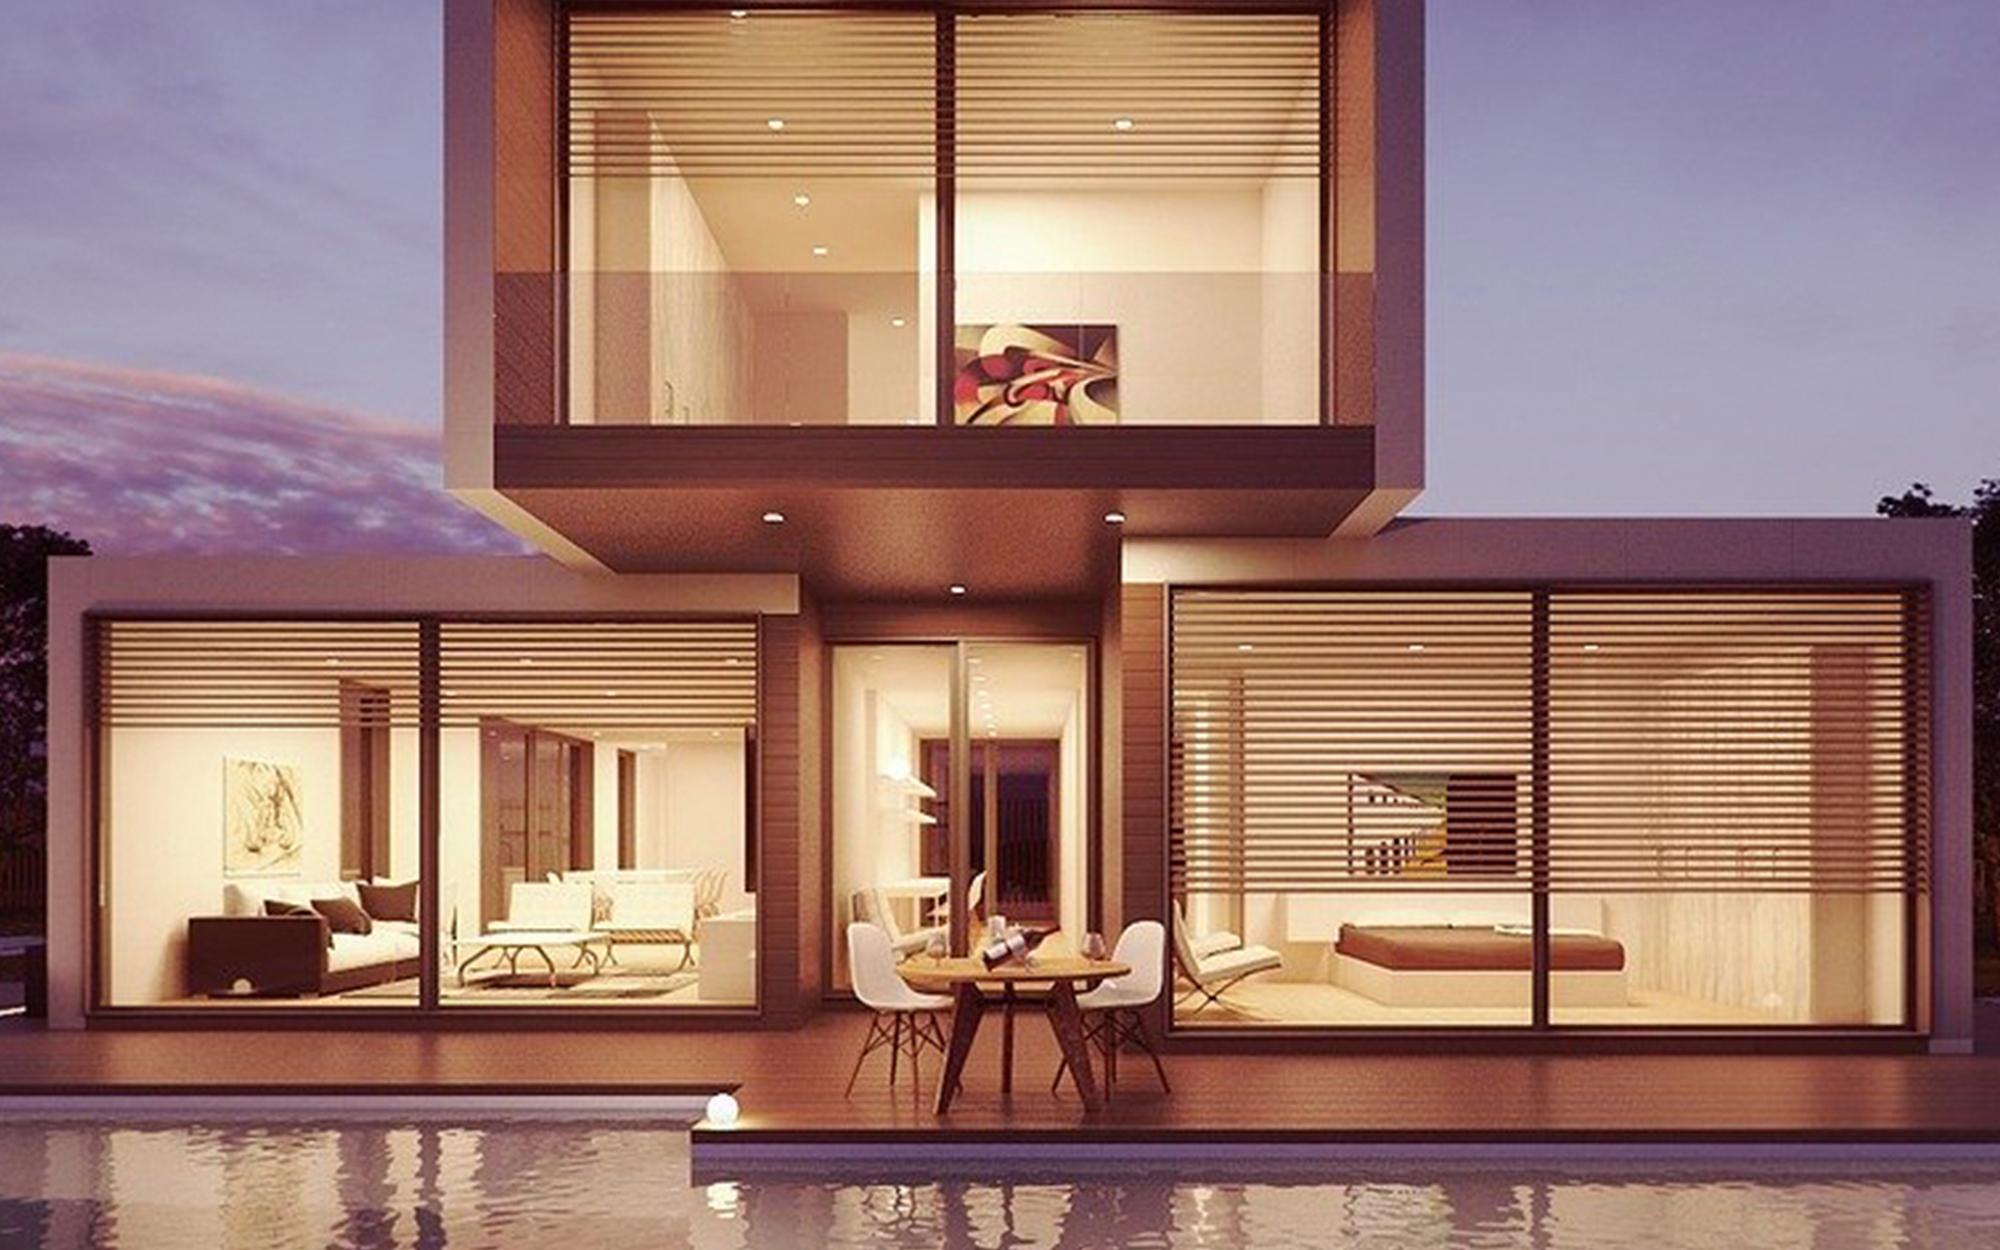 Interior Inspired By Minimalism Design Movement